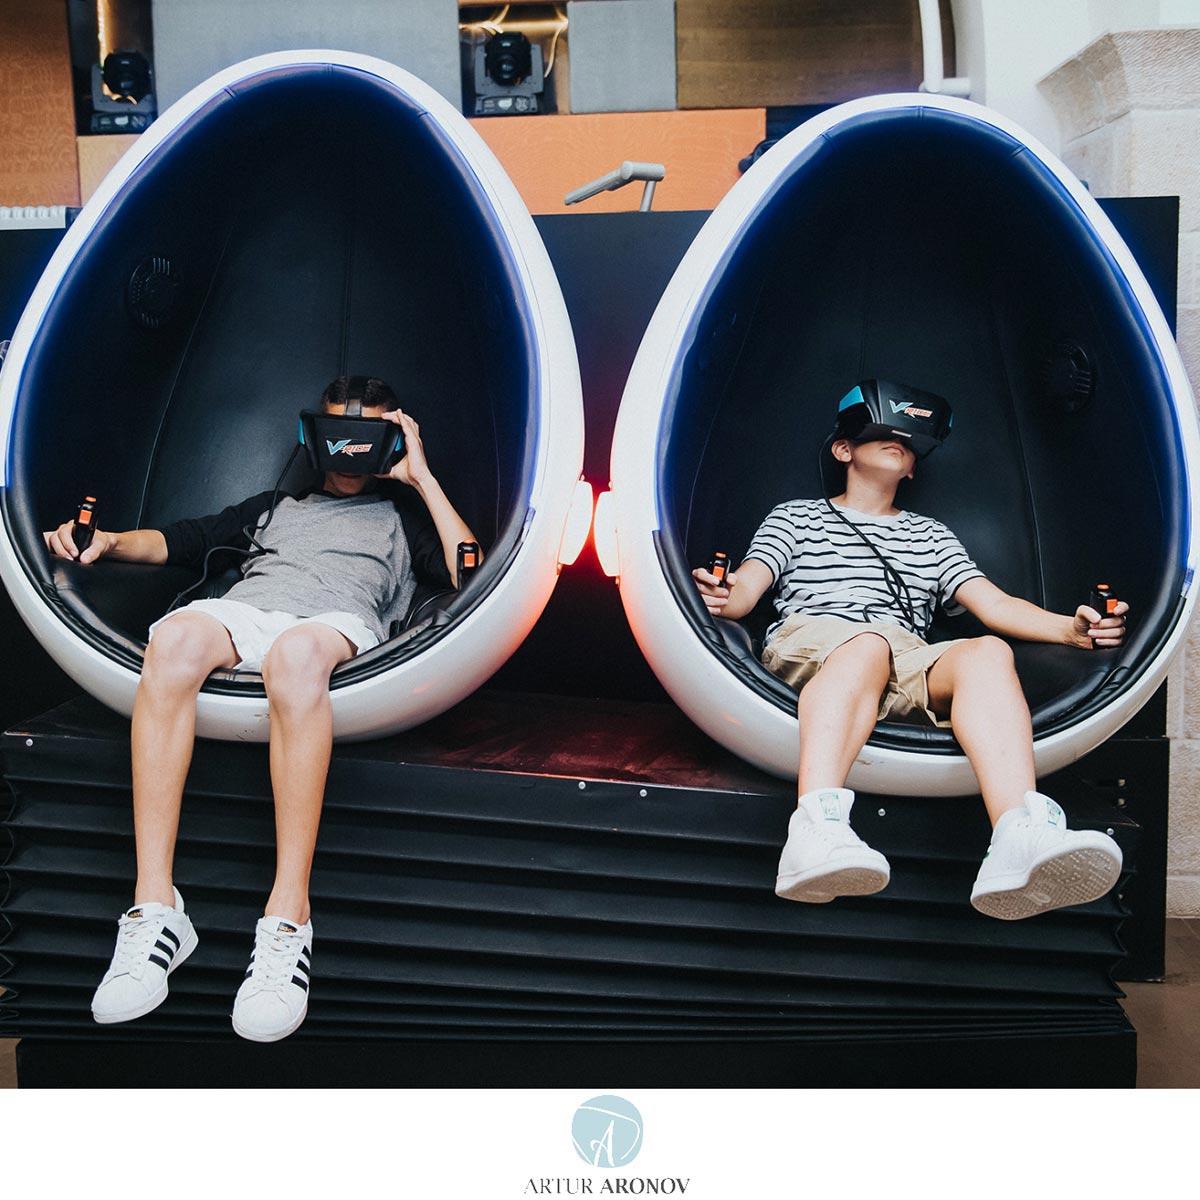 Virtual reality zone